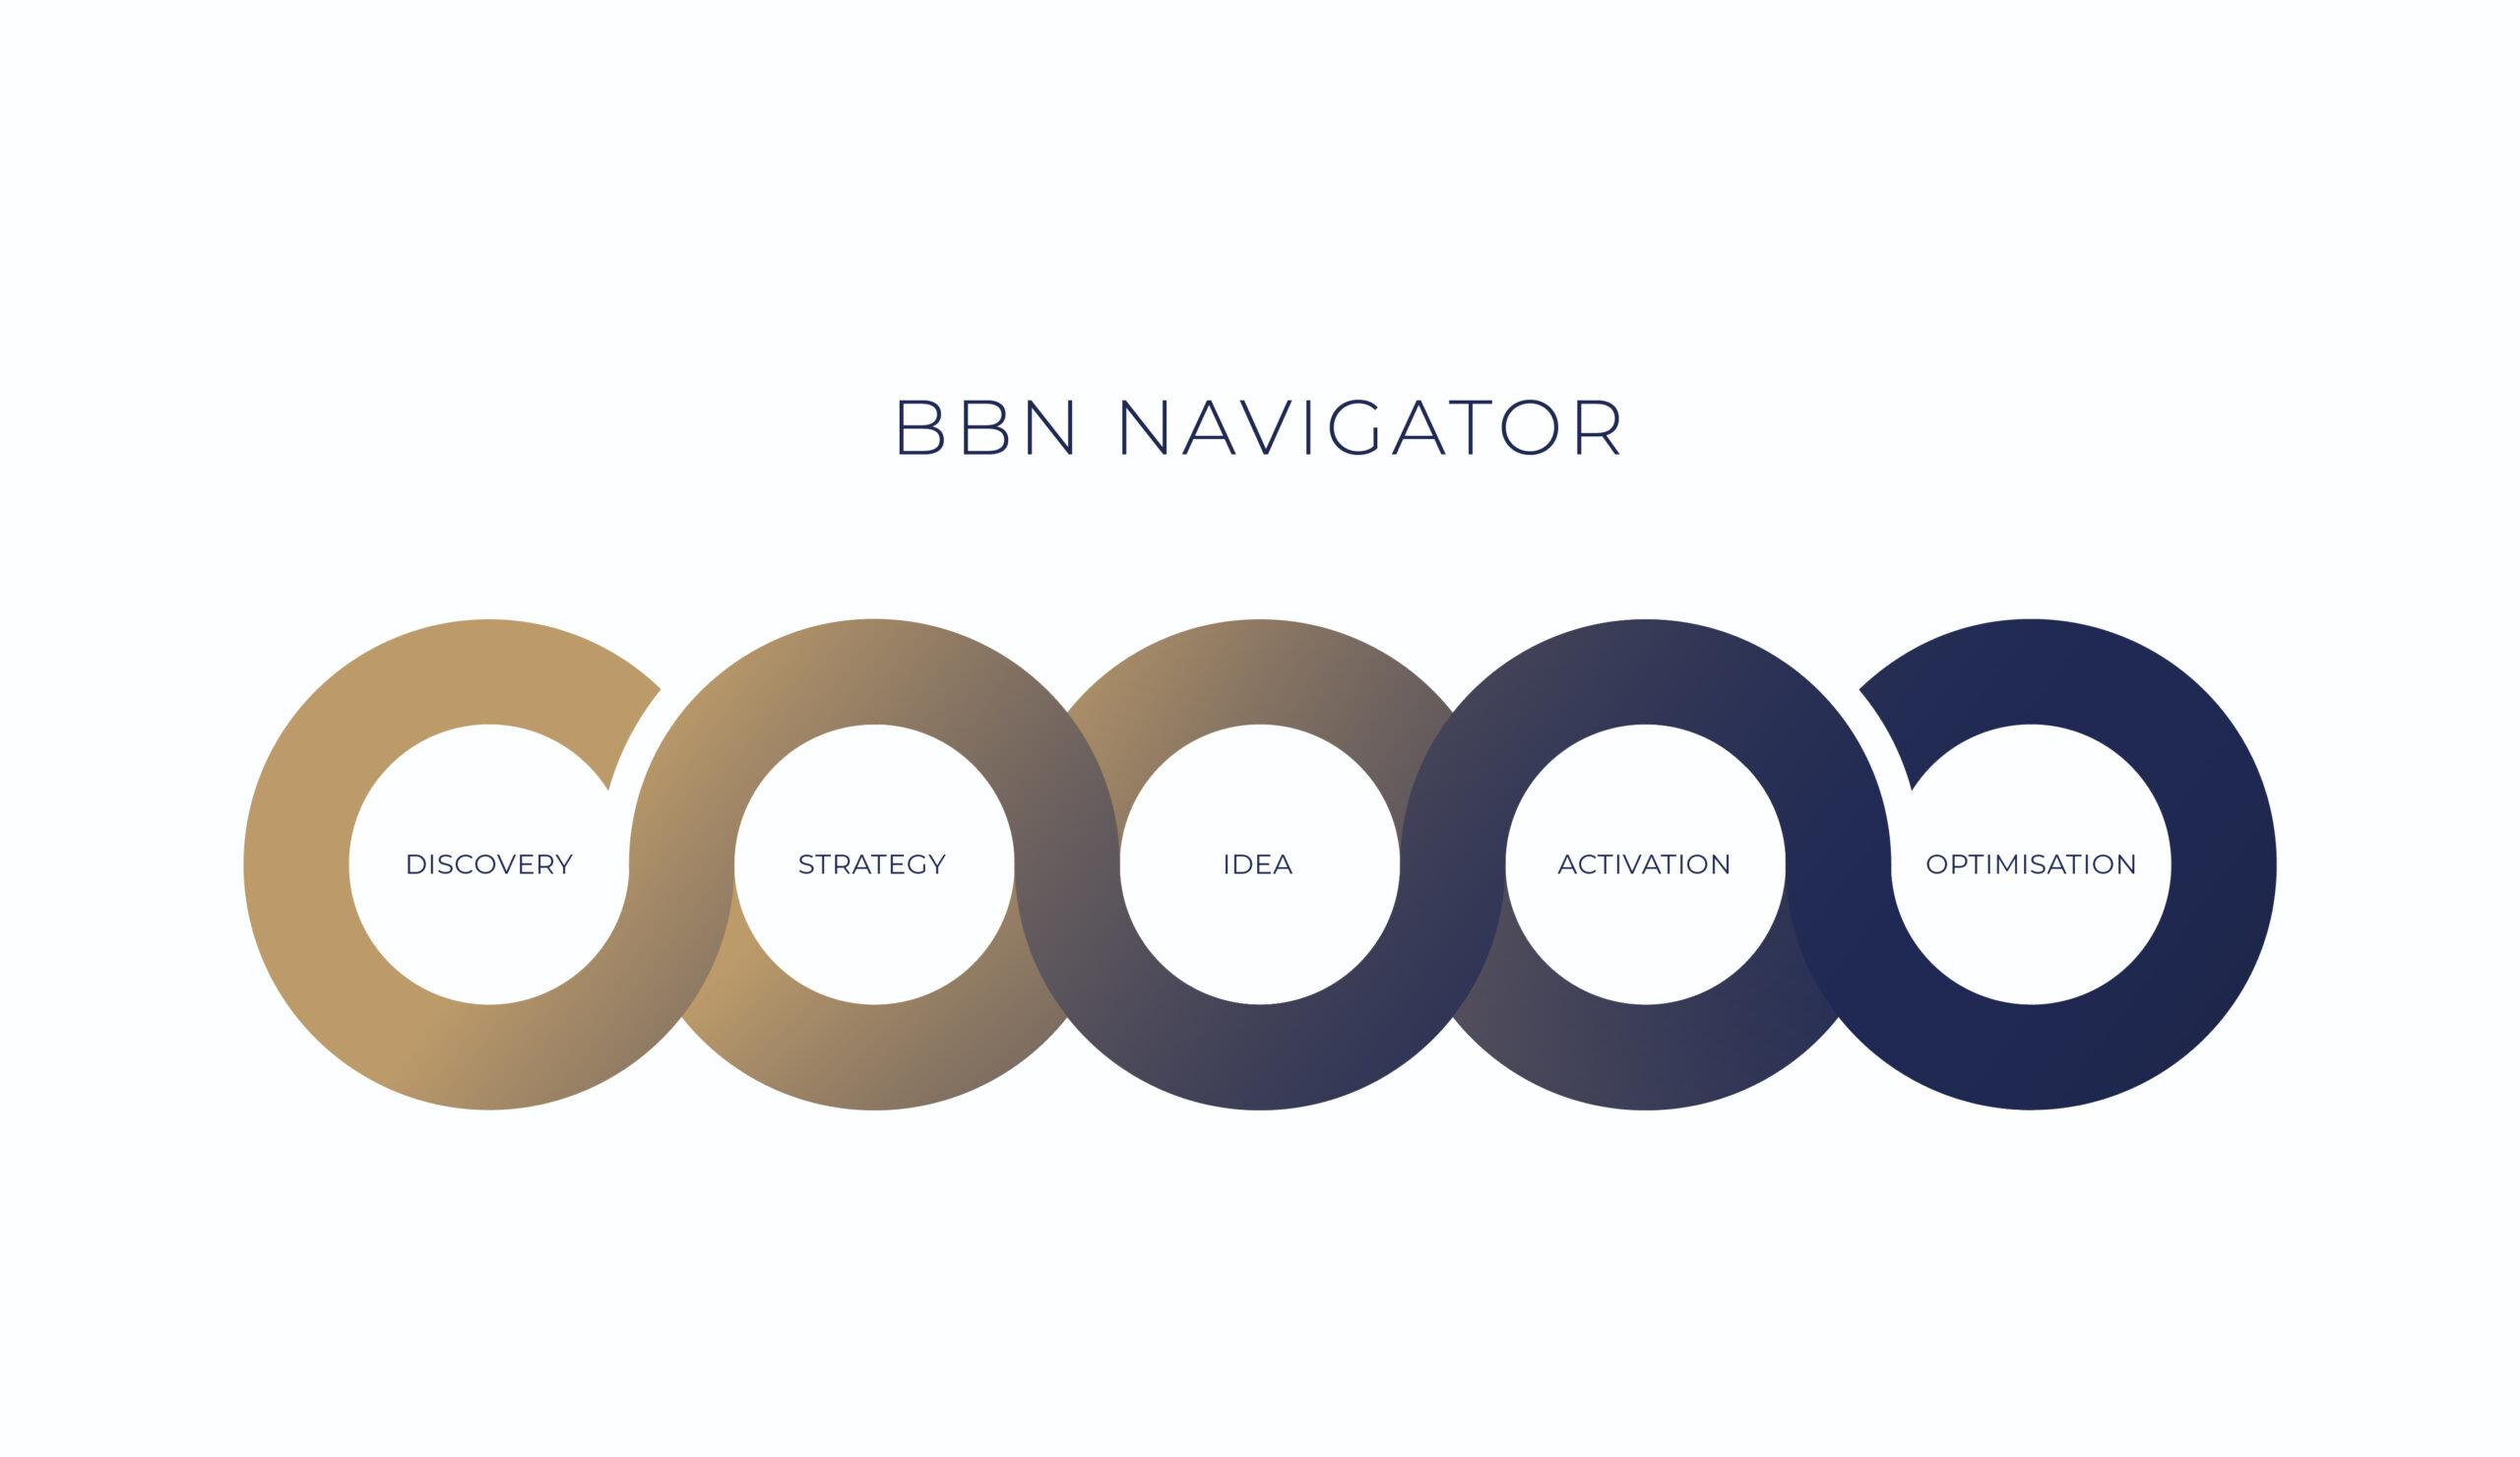 BBN Navigator